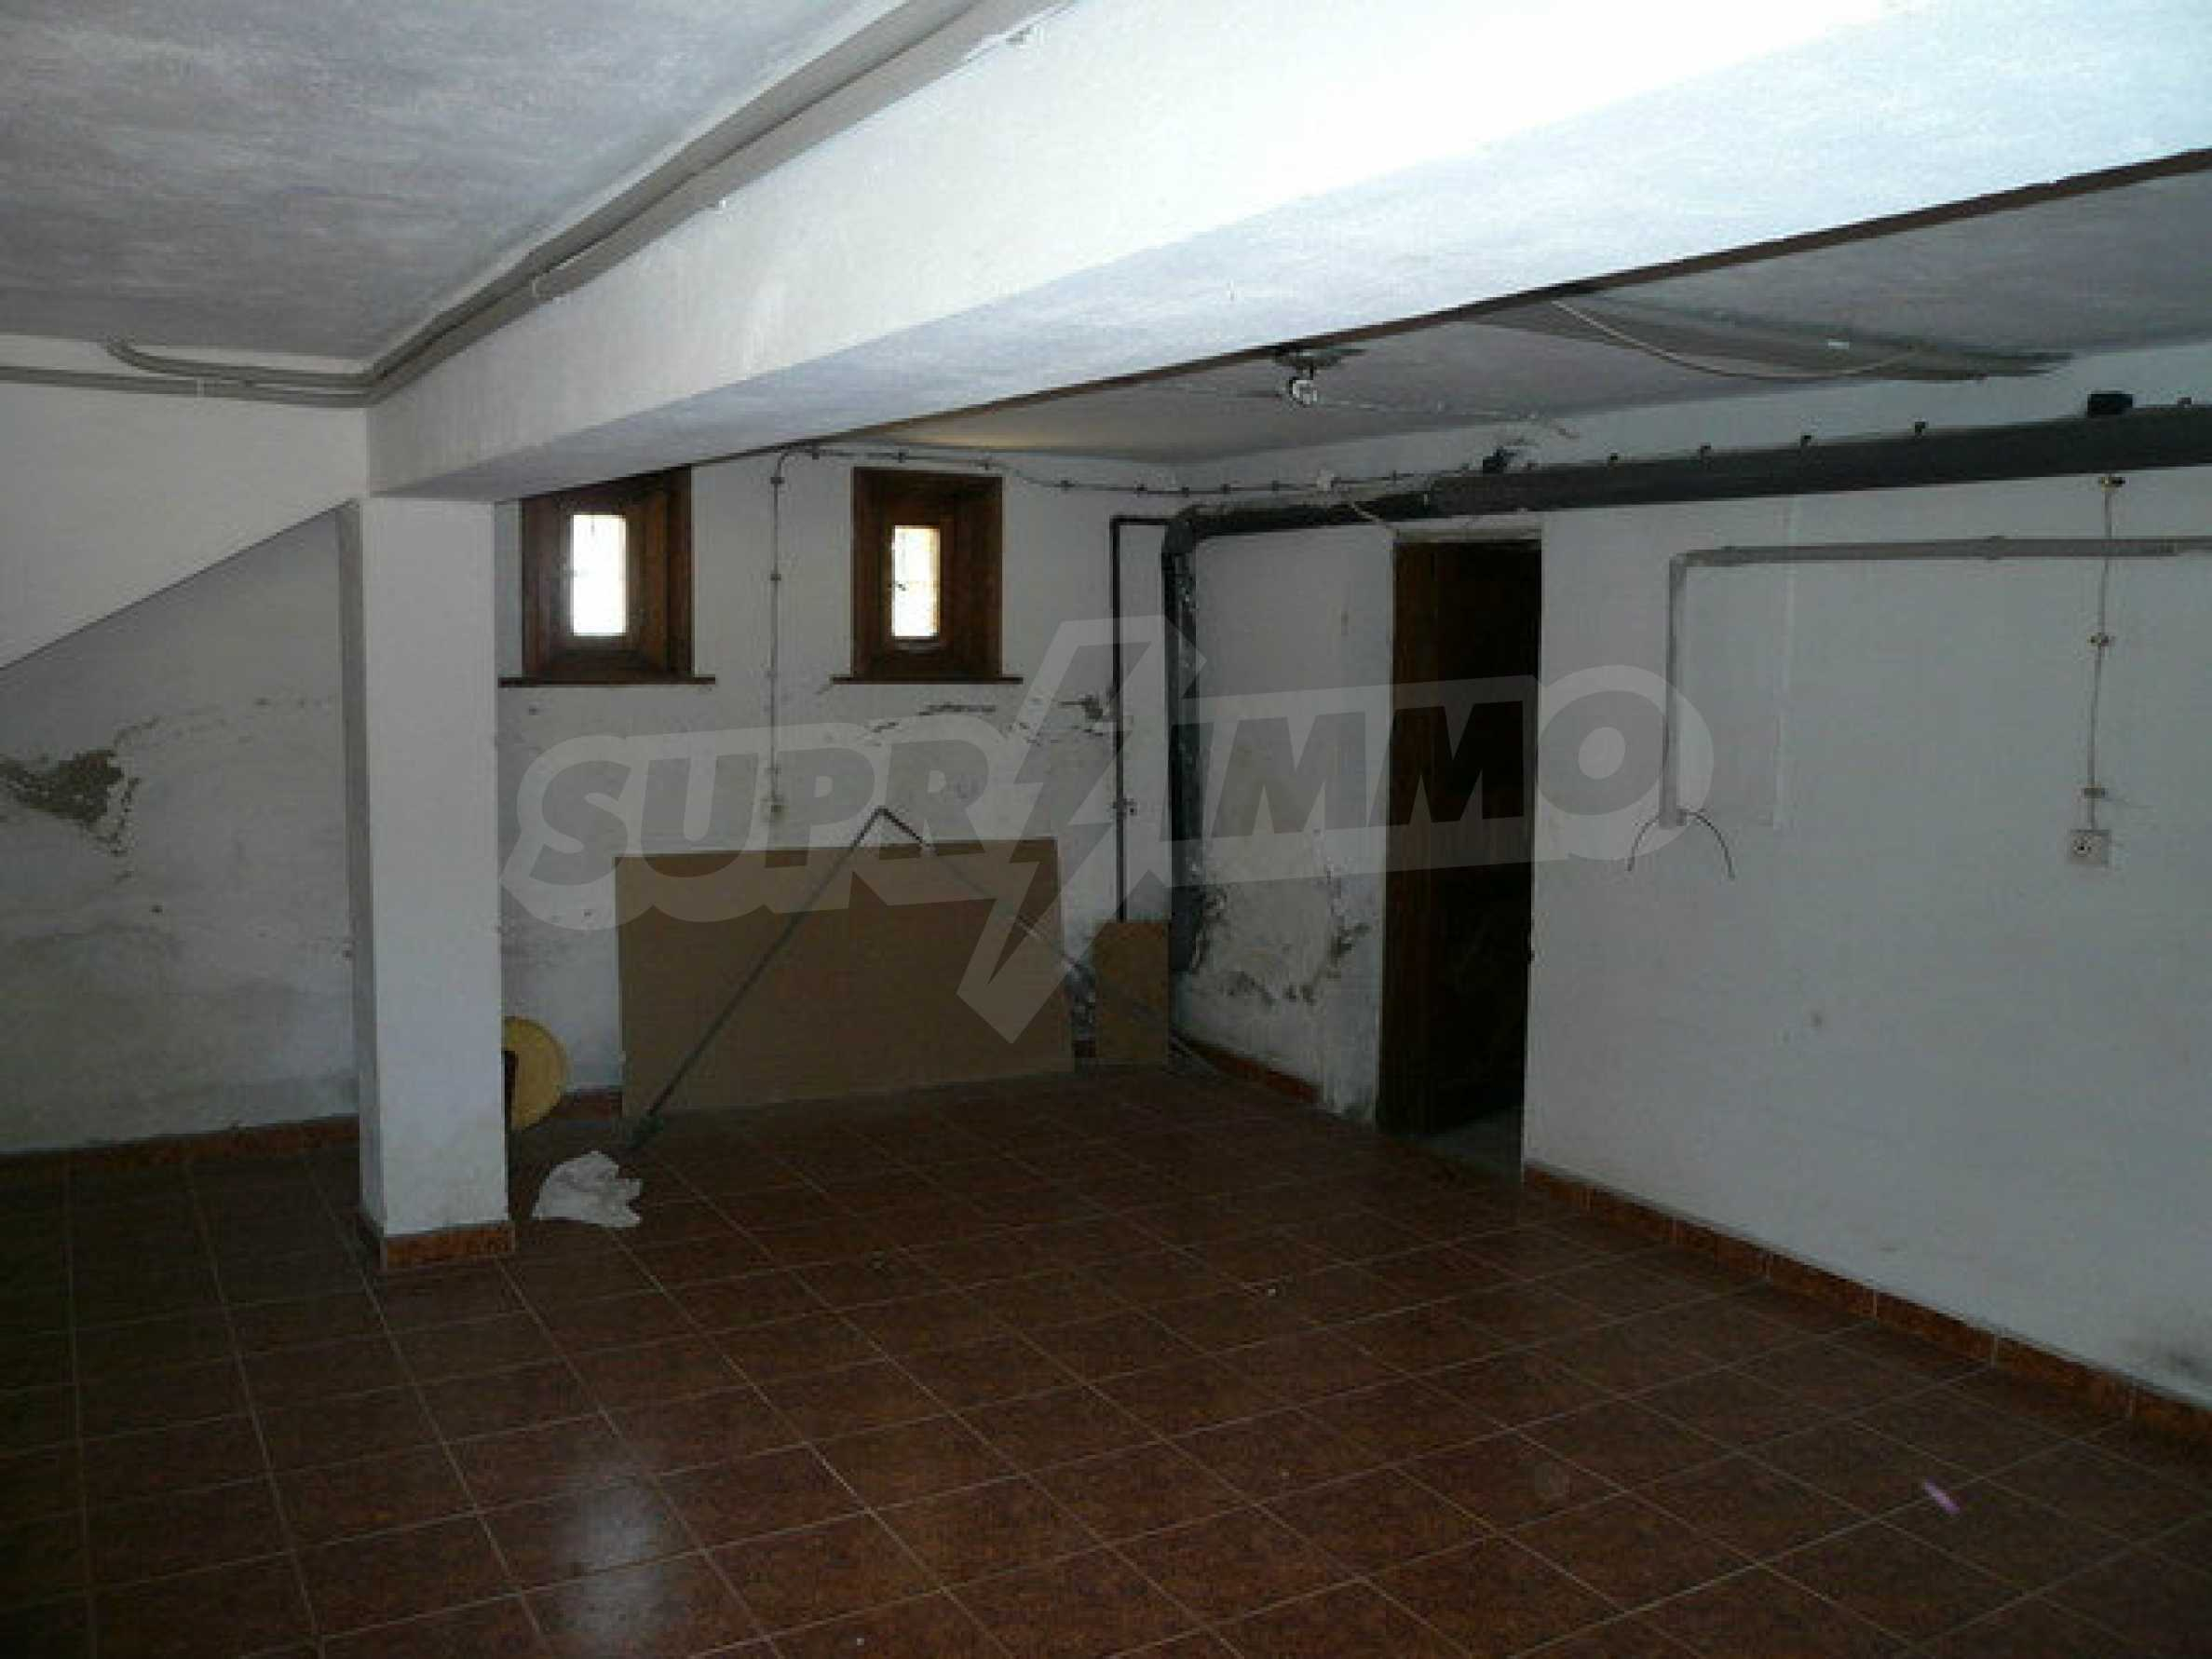 Renoviertes Haus nur 3 km von Veliko Tarnovo entfernt 51